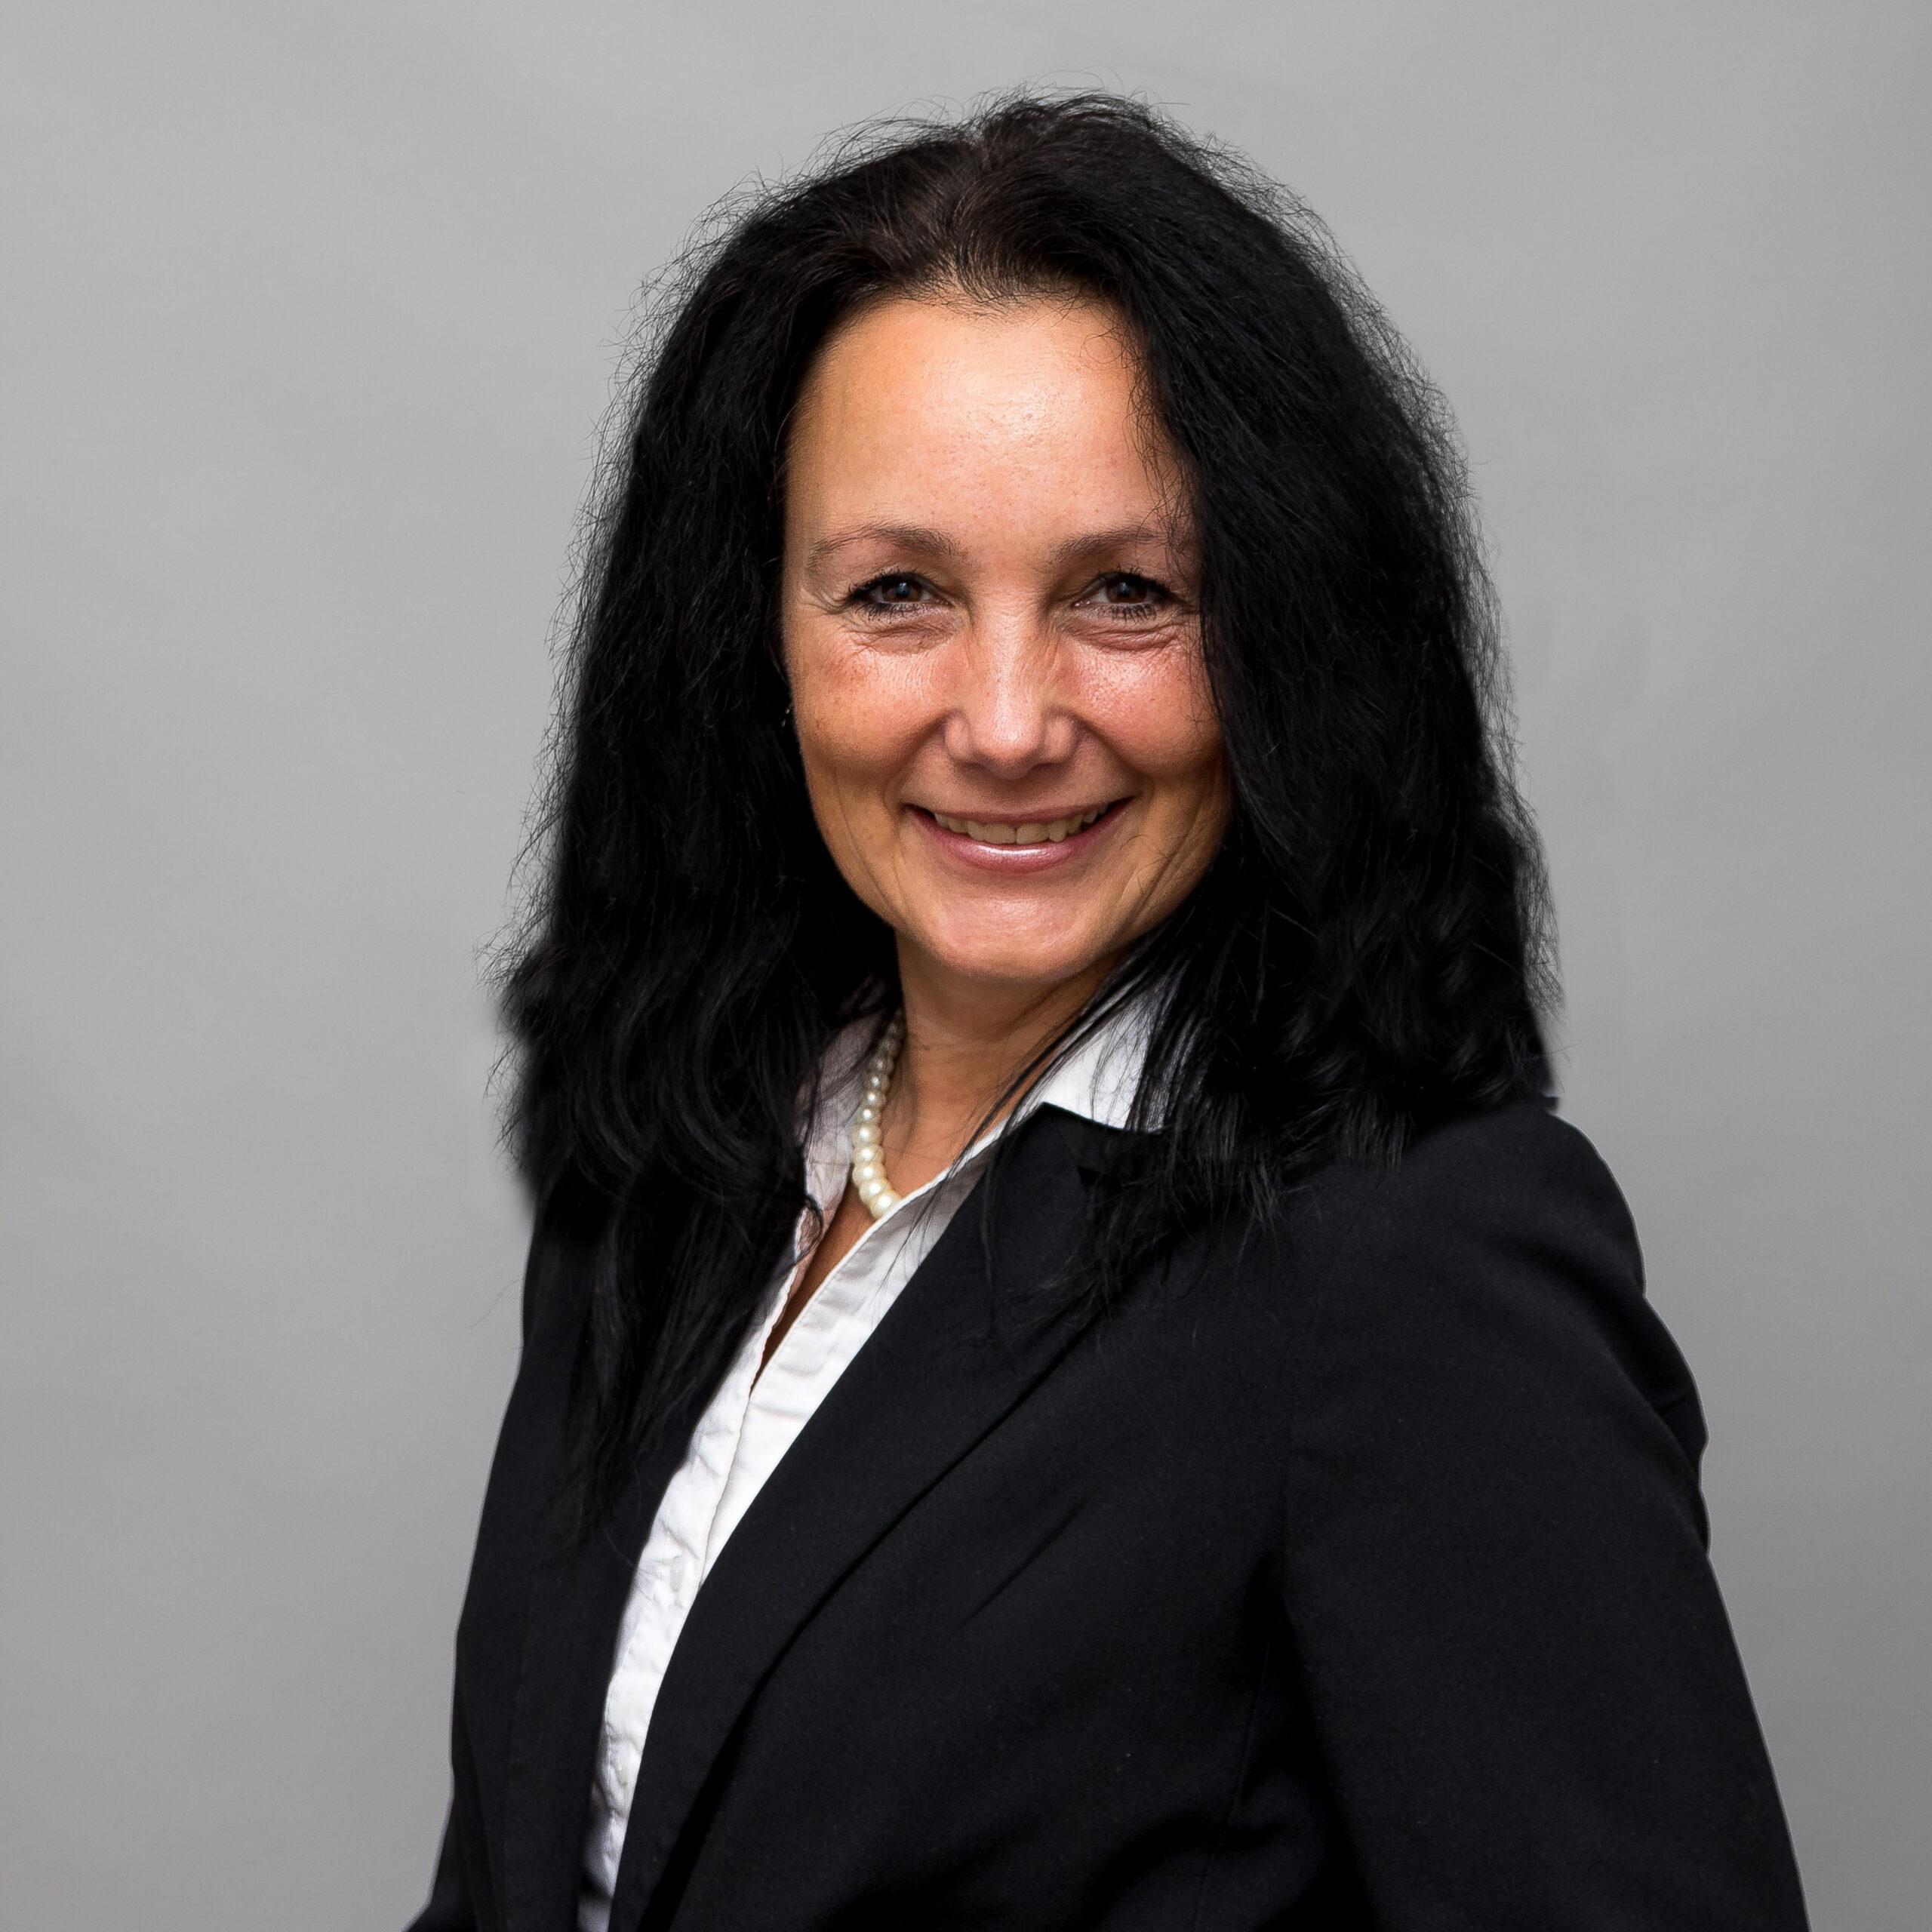 Nicole Herzog-Heymans